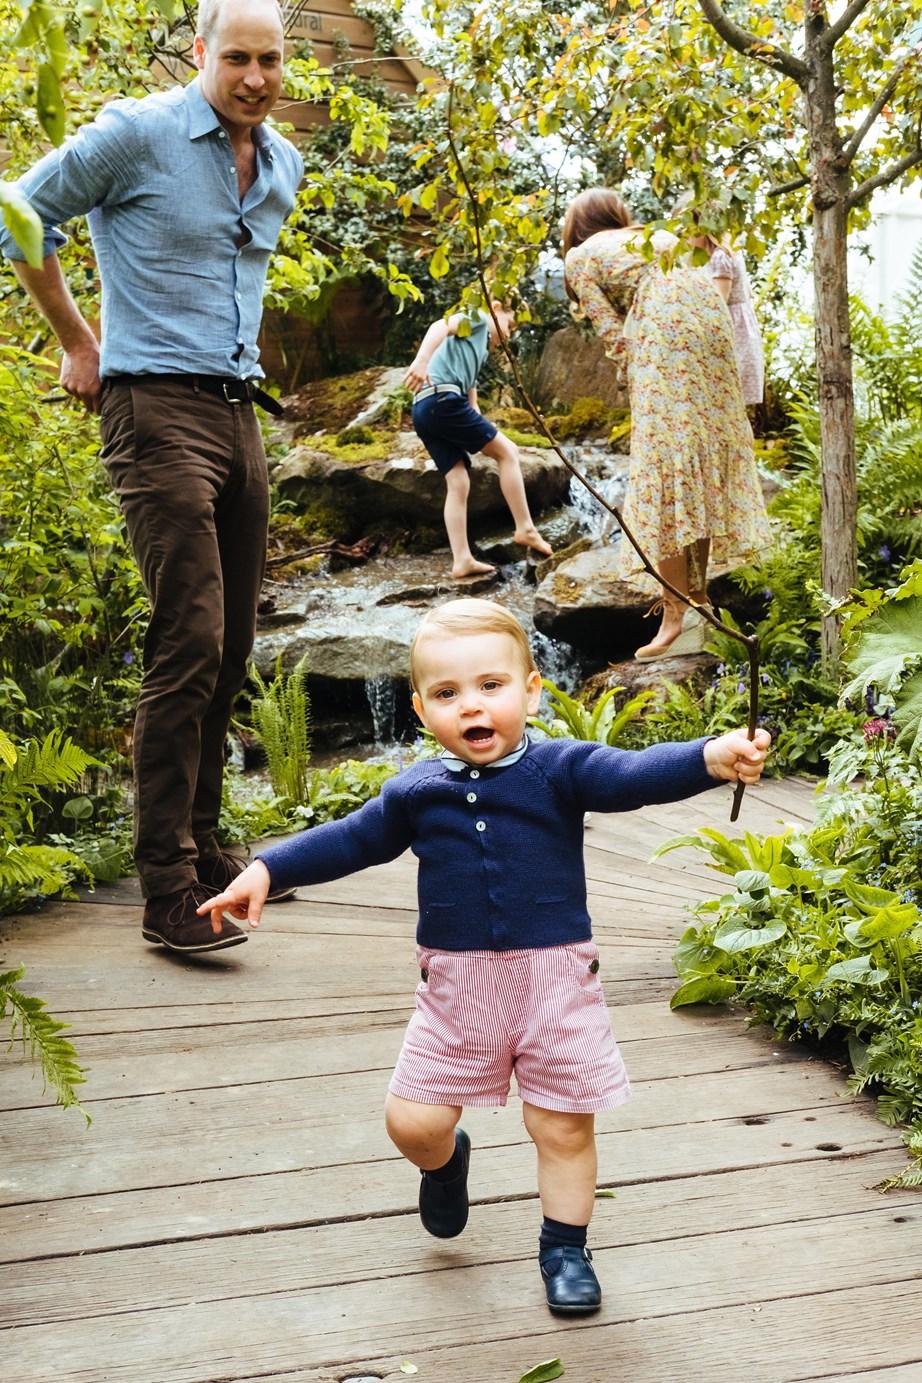 Prince Louis is walking! We can't believe how fast he's grown. *(Image: Matt Porteous /@KensingtonRoyal)*